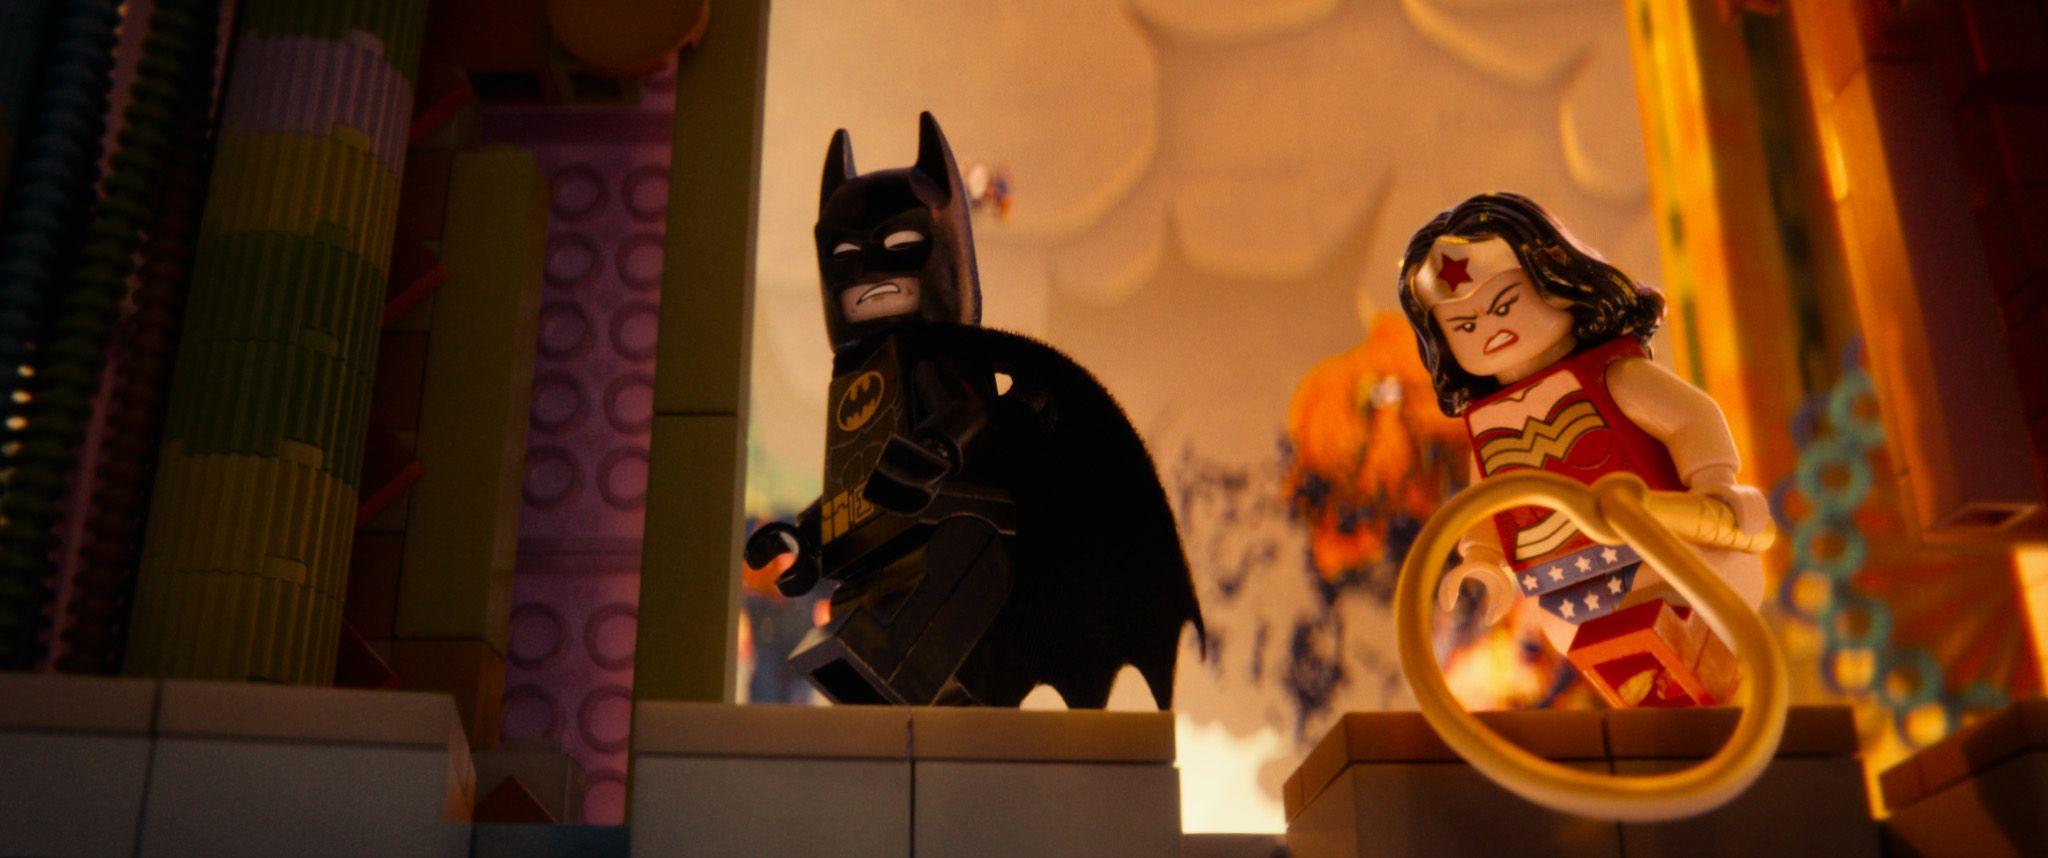 Ninjago, LEGO Batman, and LEGO Movie 2 News | Collider